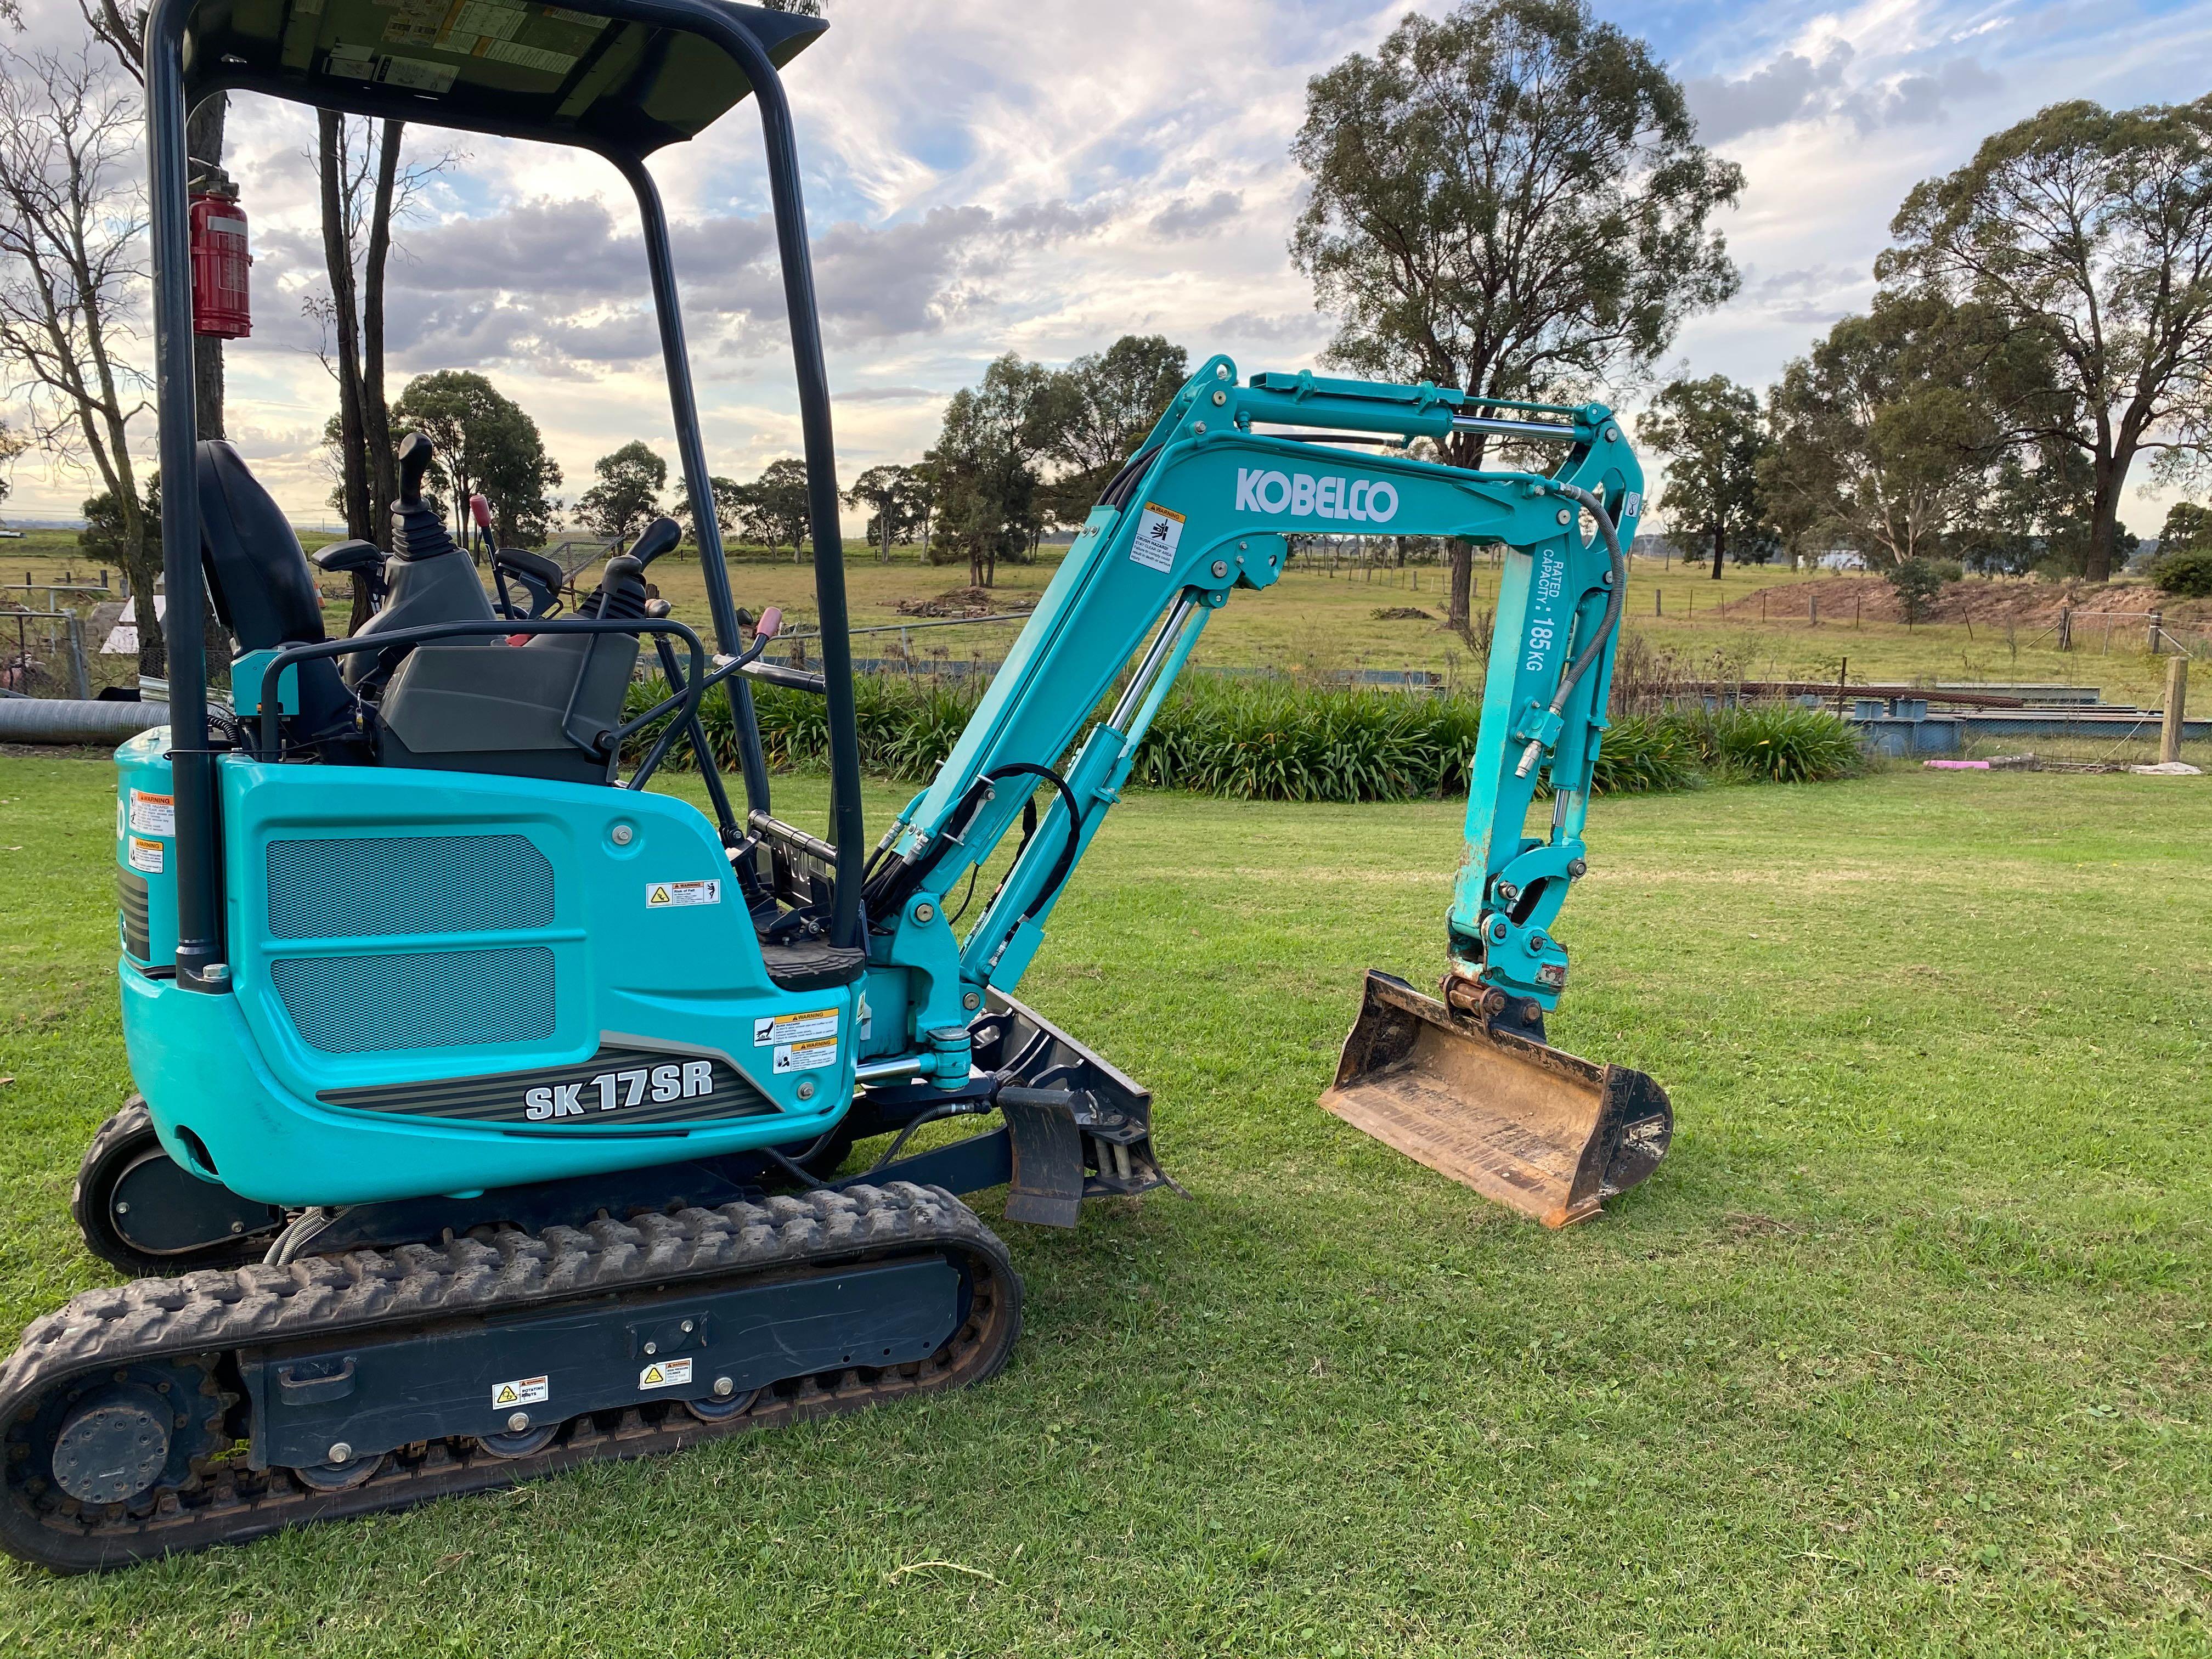 Hire Mini Excavator 1.7Tonne Digga With Hydraulic Hitch